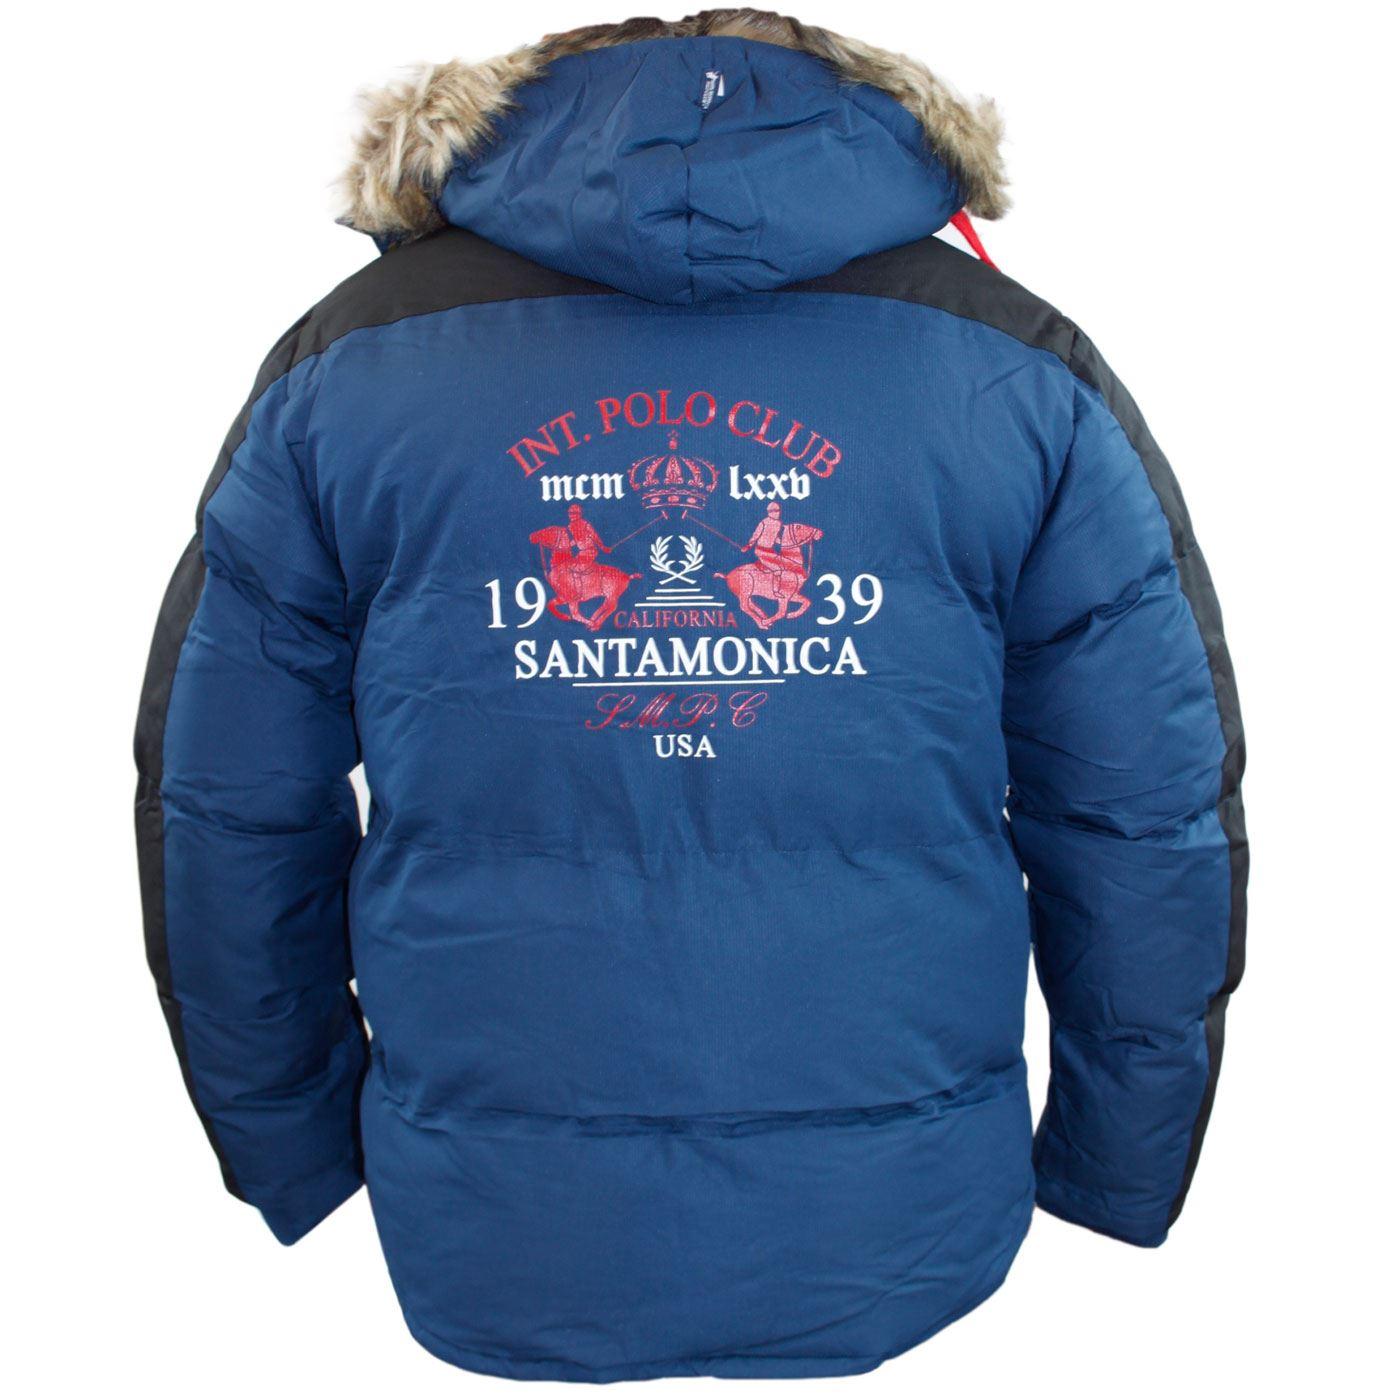 New Mens Santa monica Designer Perka Jacket Lined Winter Coat Detachable Hood